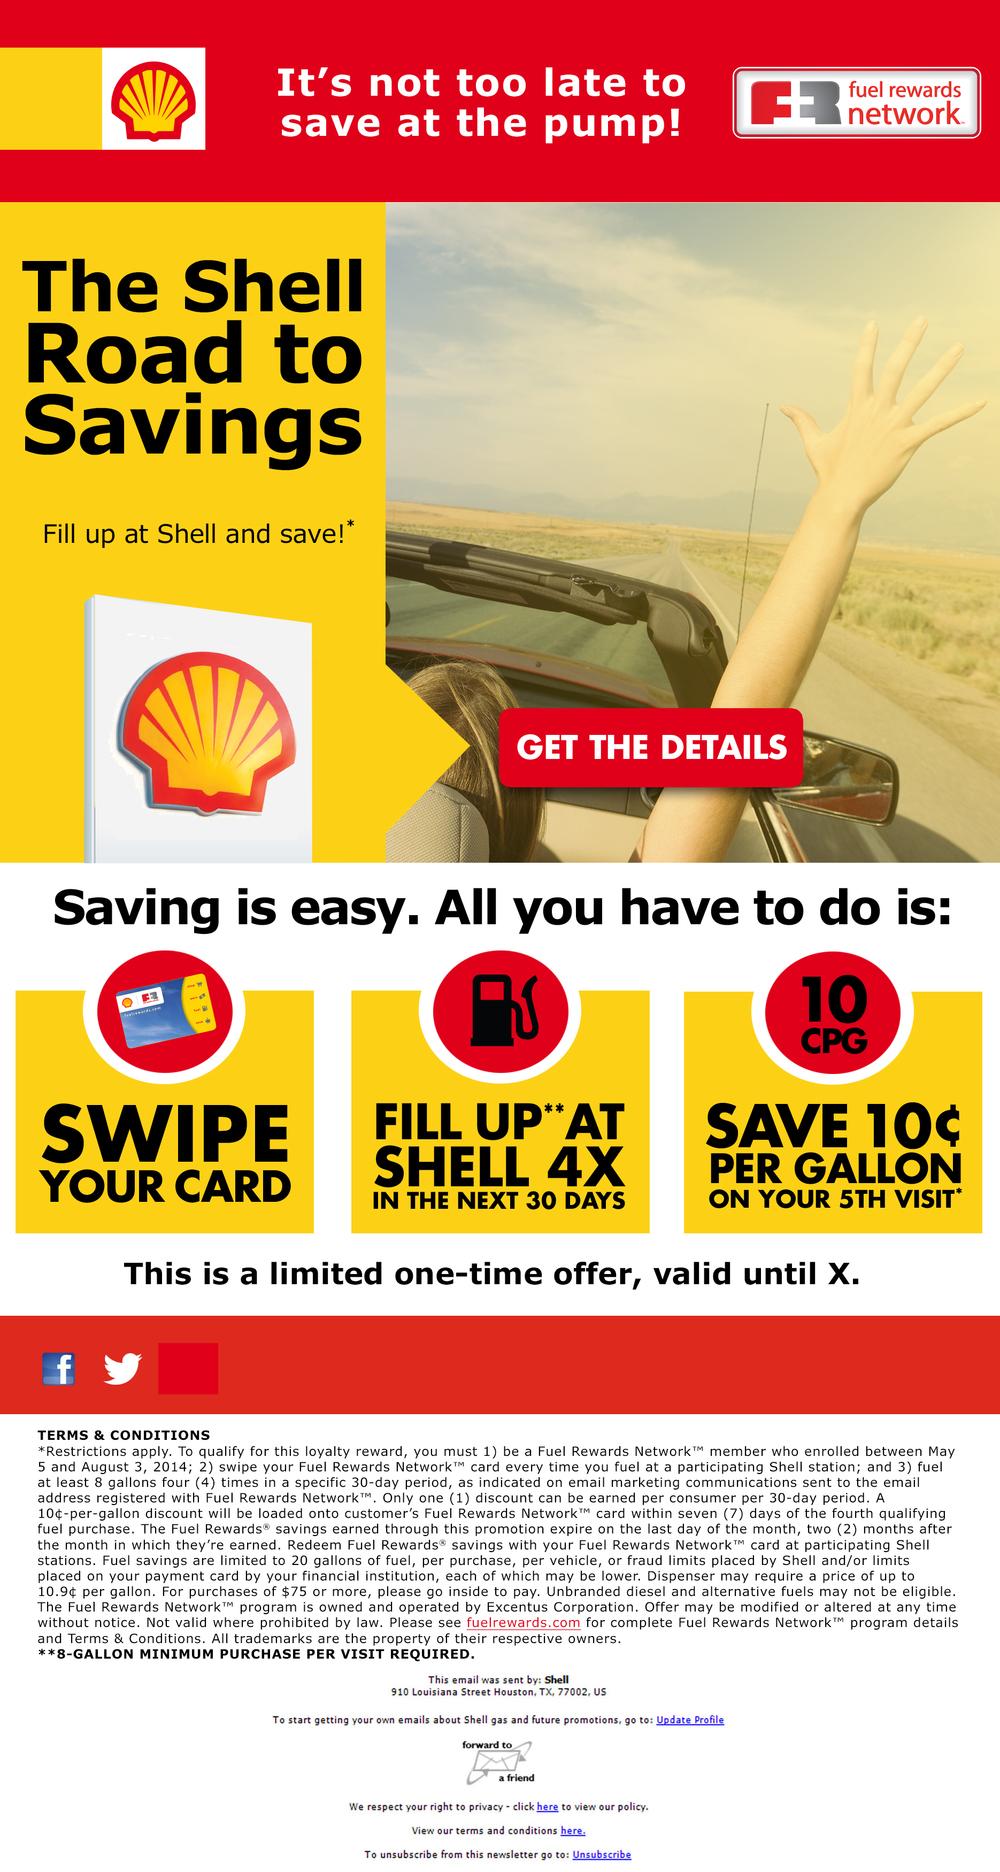 Shell-Reminder-Email-Desktop-VerA.jpg